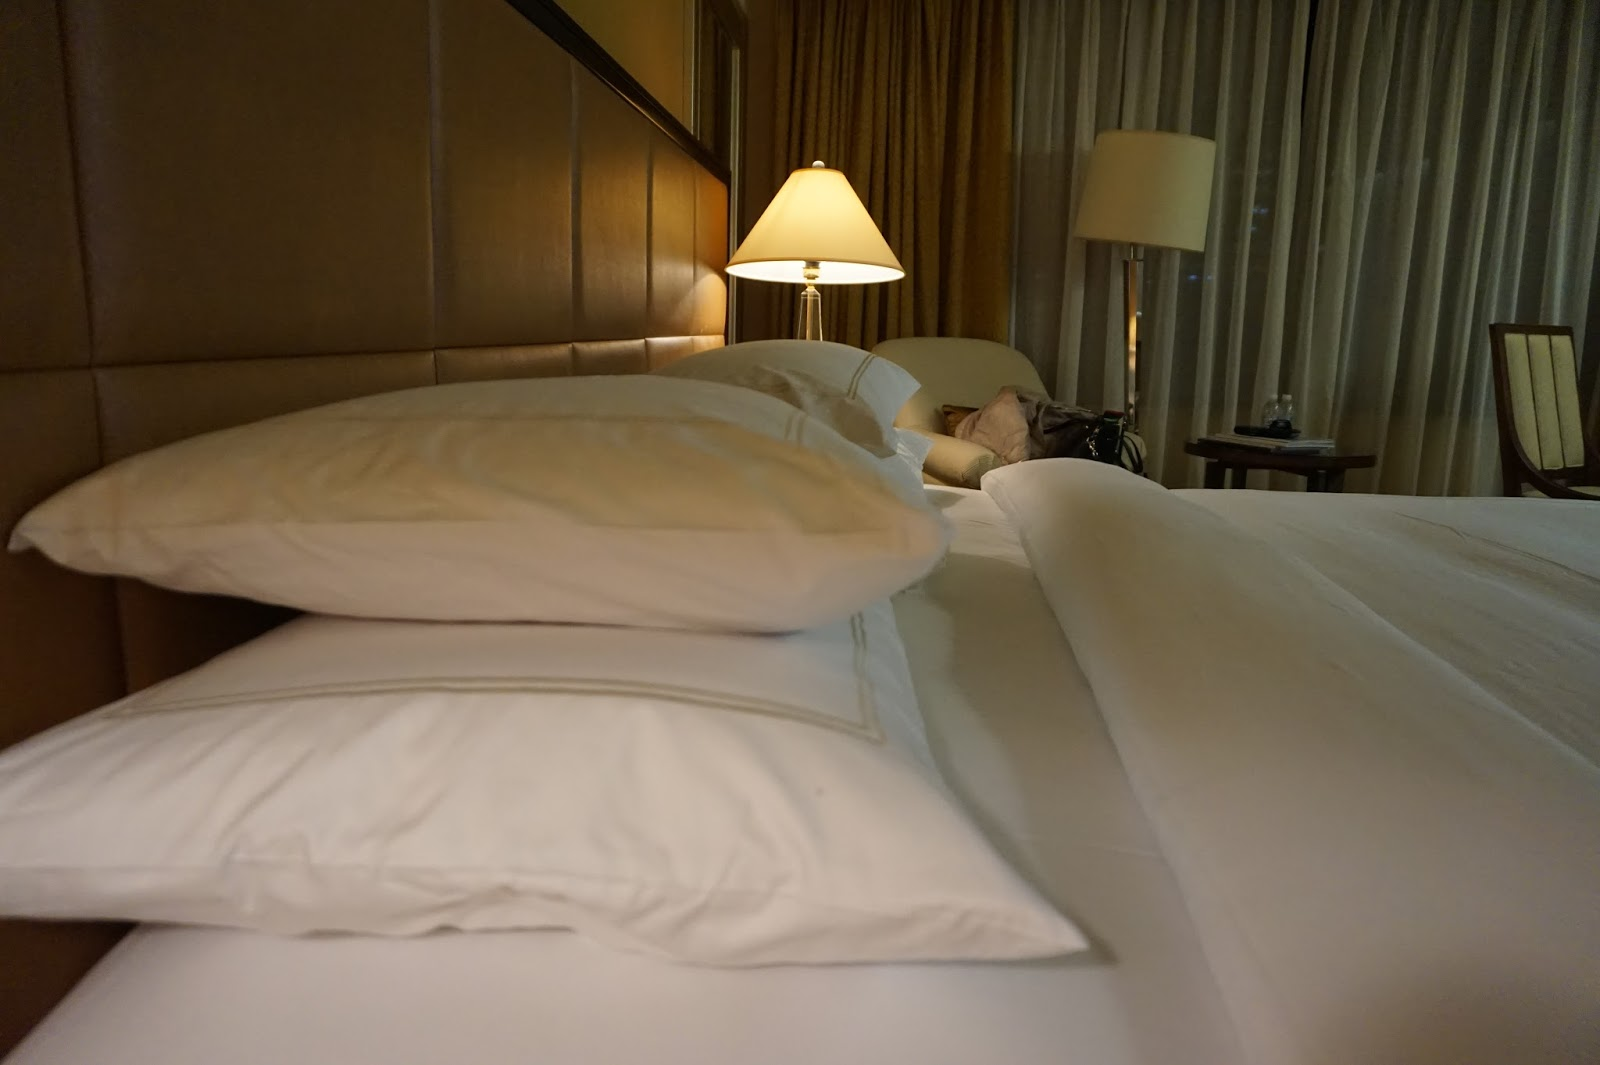 portman ritz-carlton shanghai china prc hotel review deluxe room bedroom